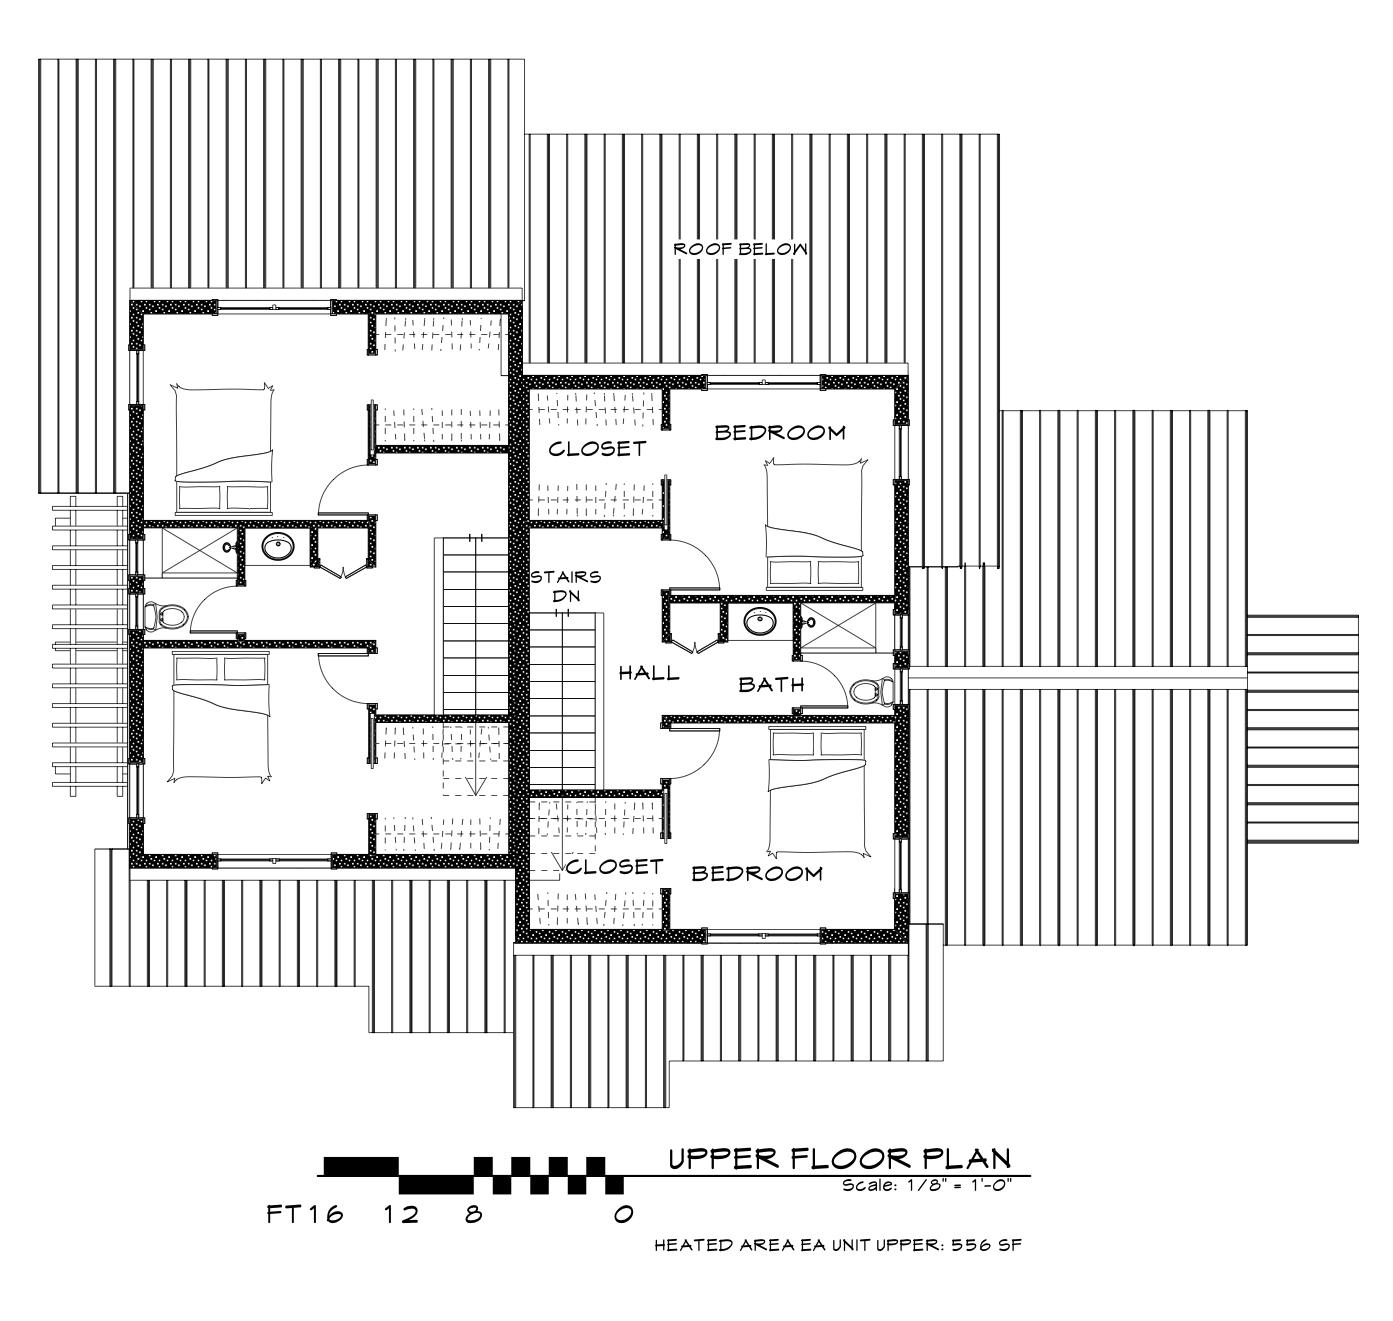 2 Story - Upper Floor